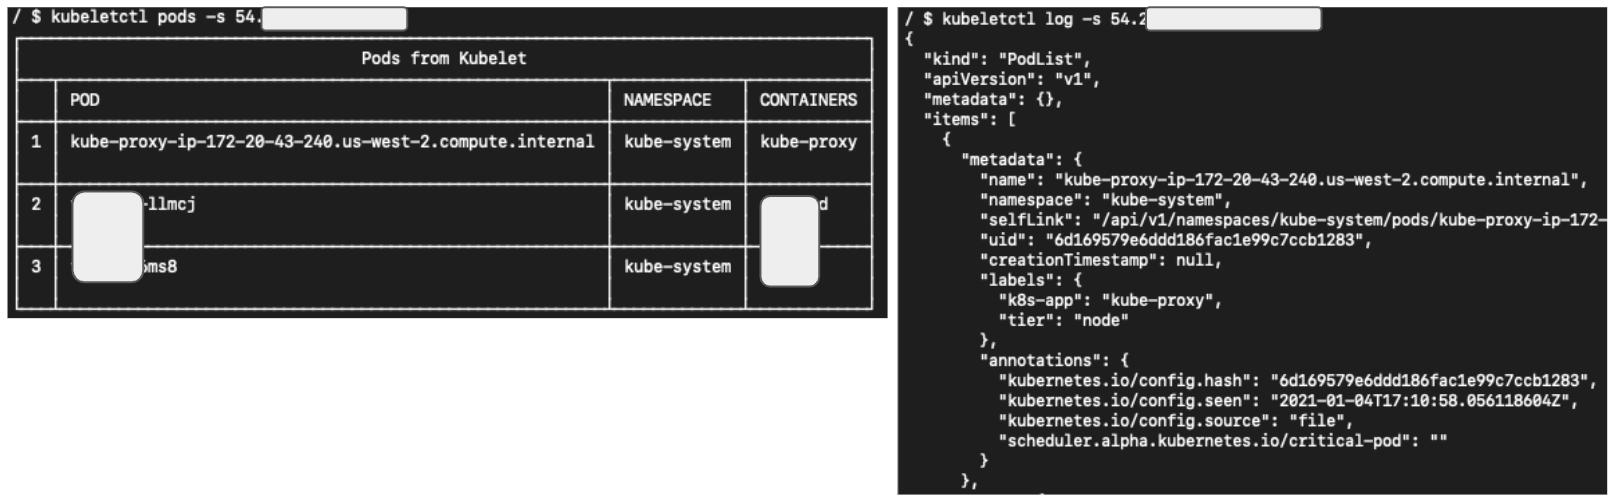 Figure 5. Accessing kubelet server anonymously using kubeletctl.